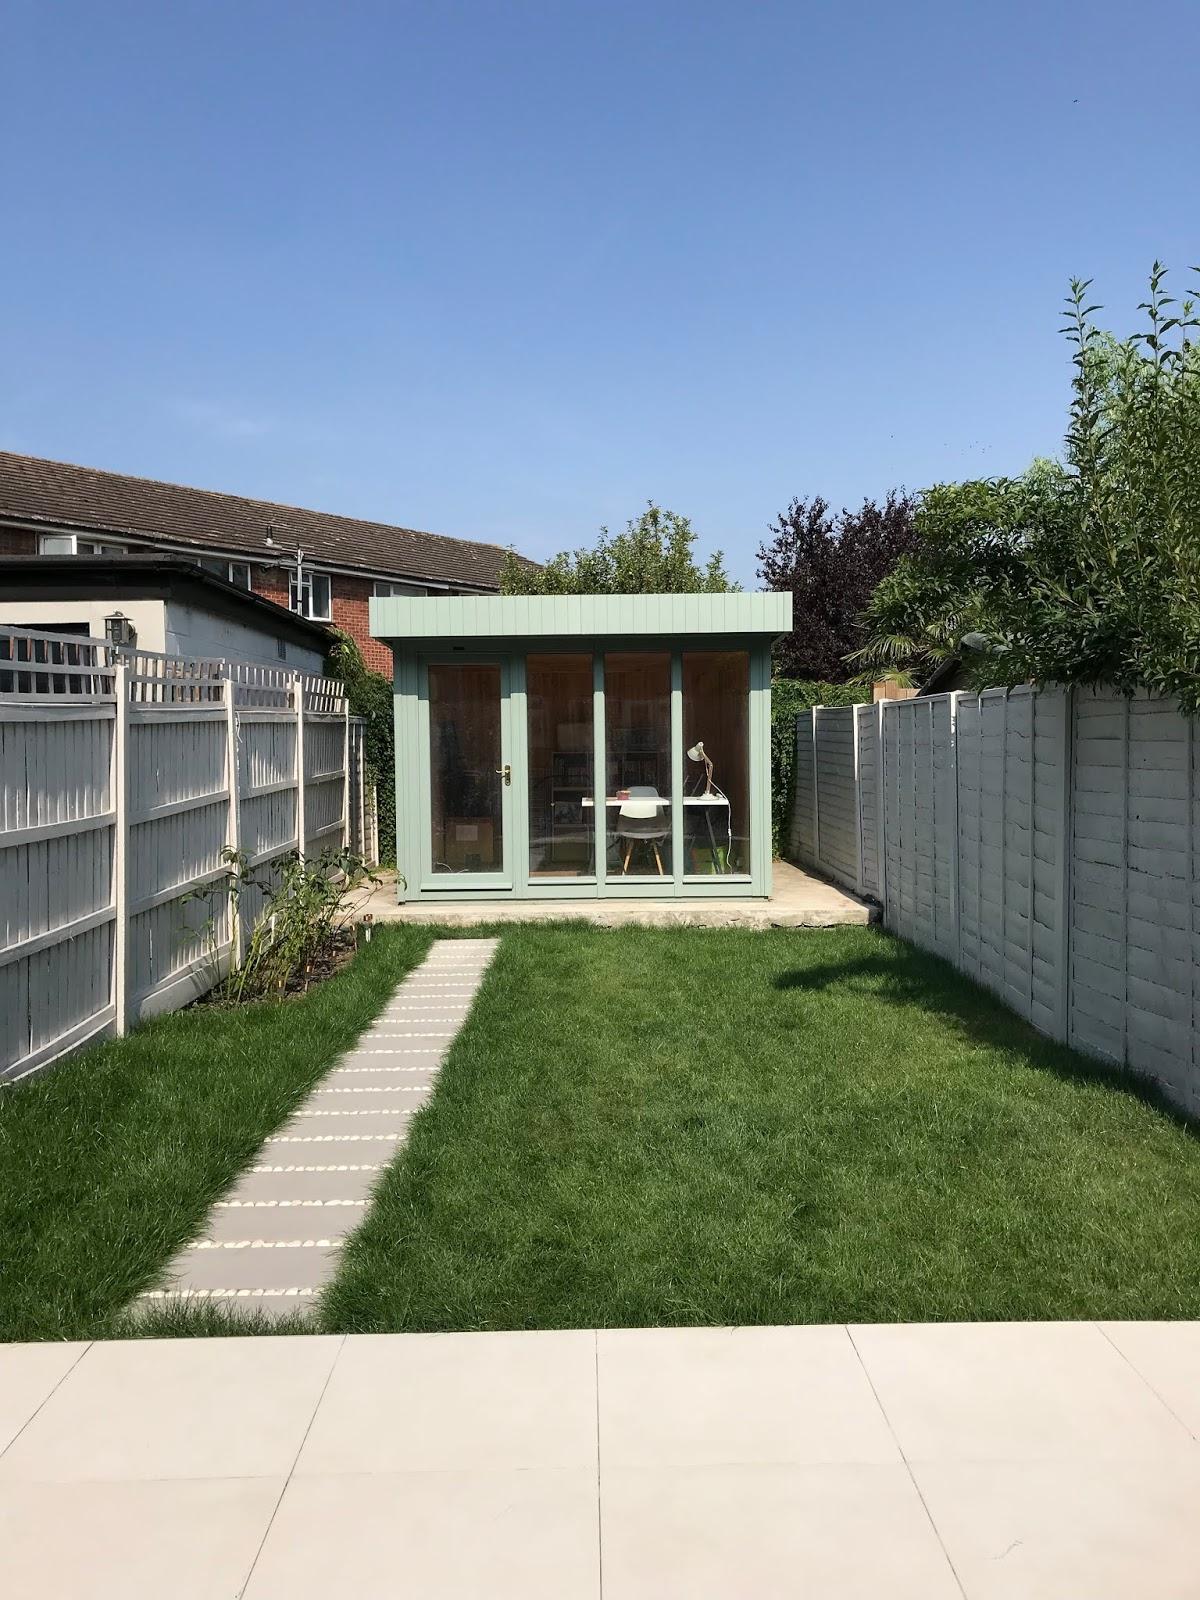 Garden-Renovation-On-A-Tight-Budget